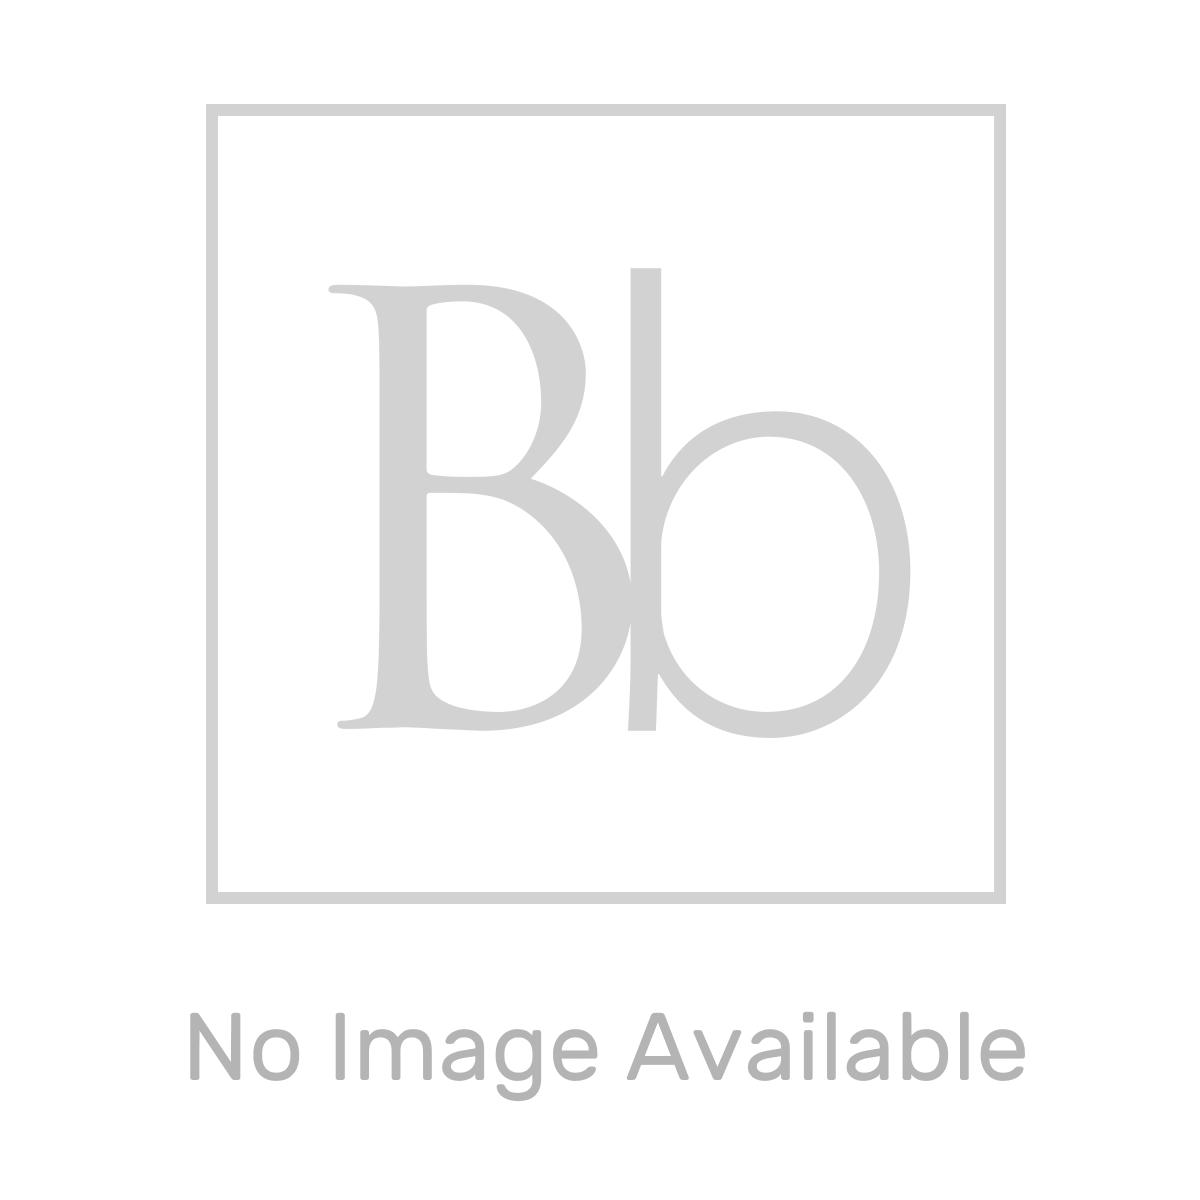 Frontline Harrow Chrome Heated Towel Rail With Ladder-Style Towel Bar W450 H1200